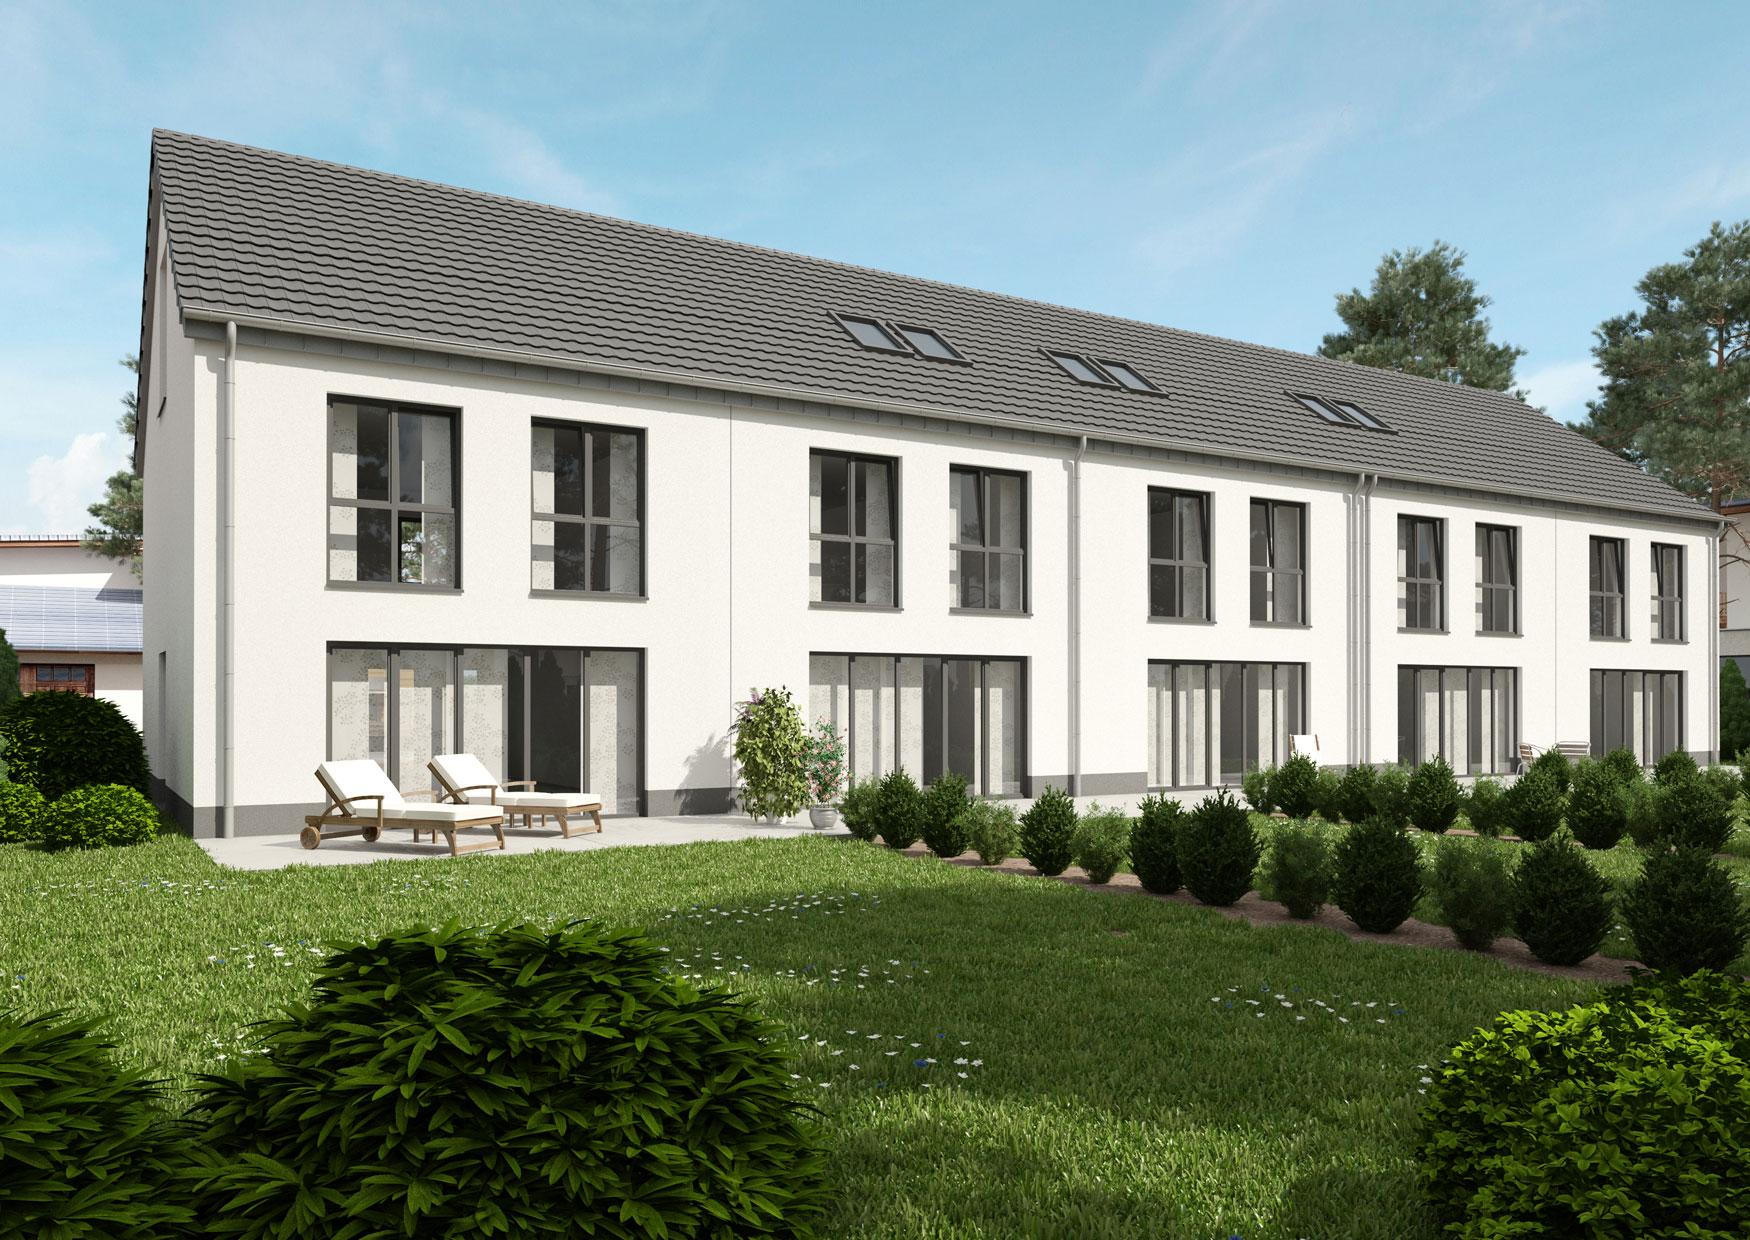 Pick Projekt - Düsseldorfer Strasse, Grevenbroich